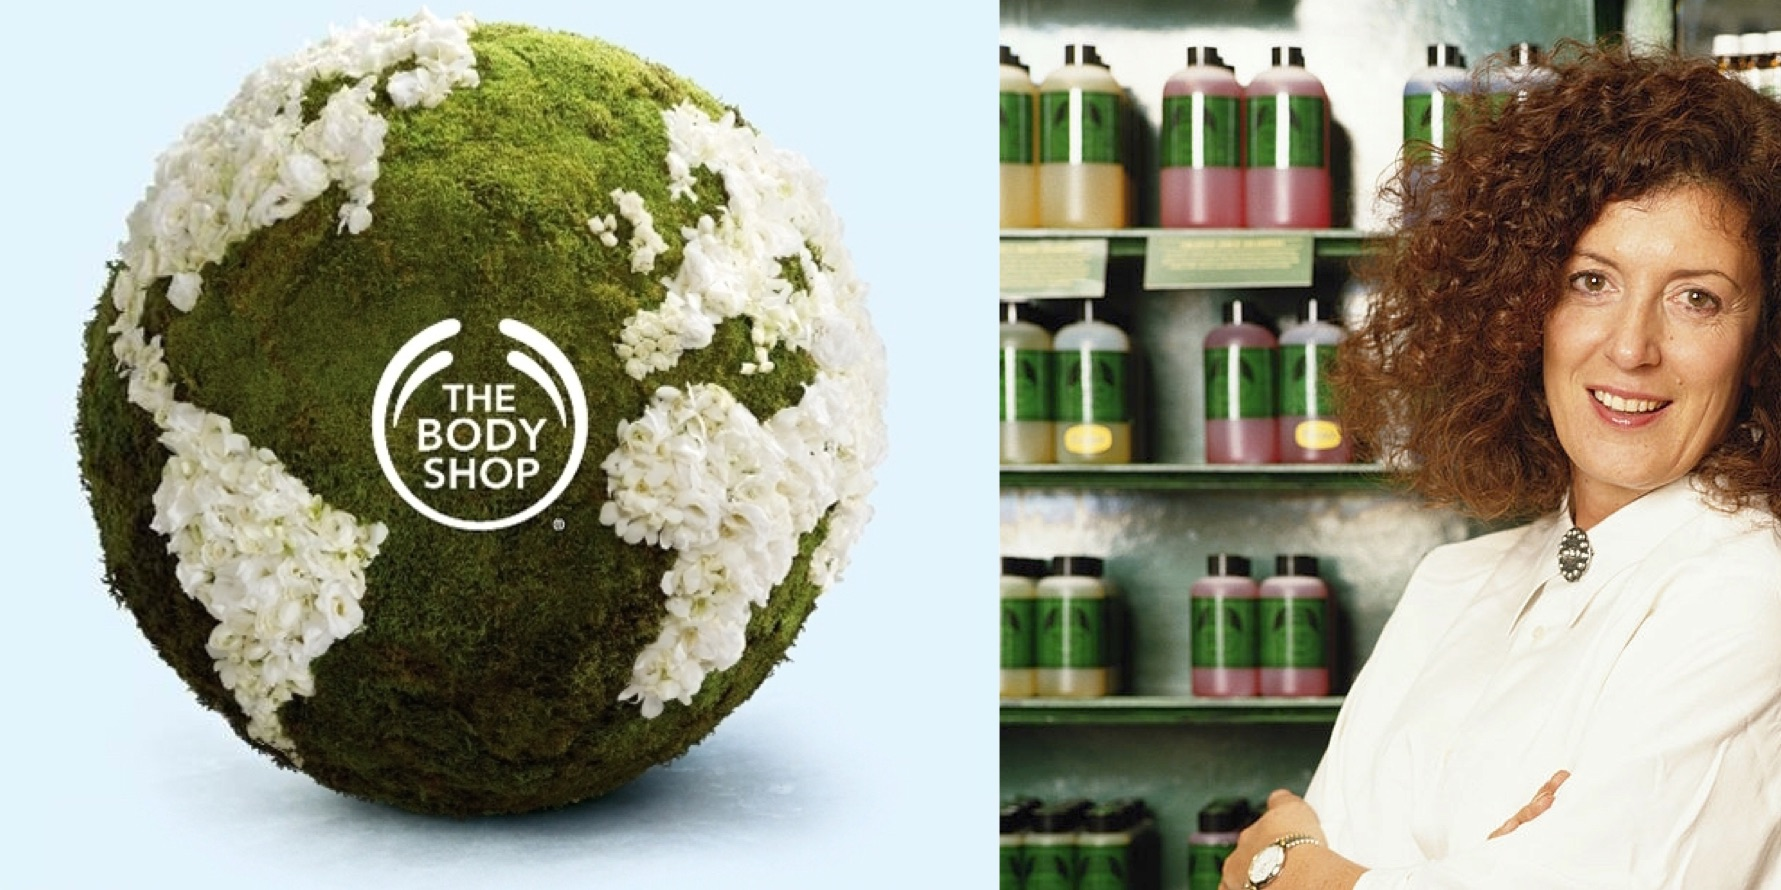 beauty bucketlist update the body shop brushes vegan. Black Bedroom Furniture Sets. Home Design Ideas